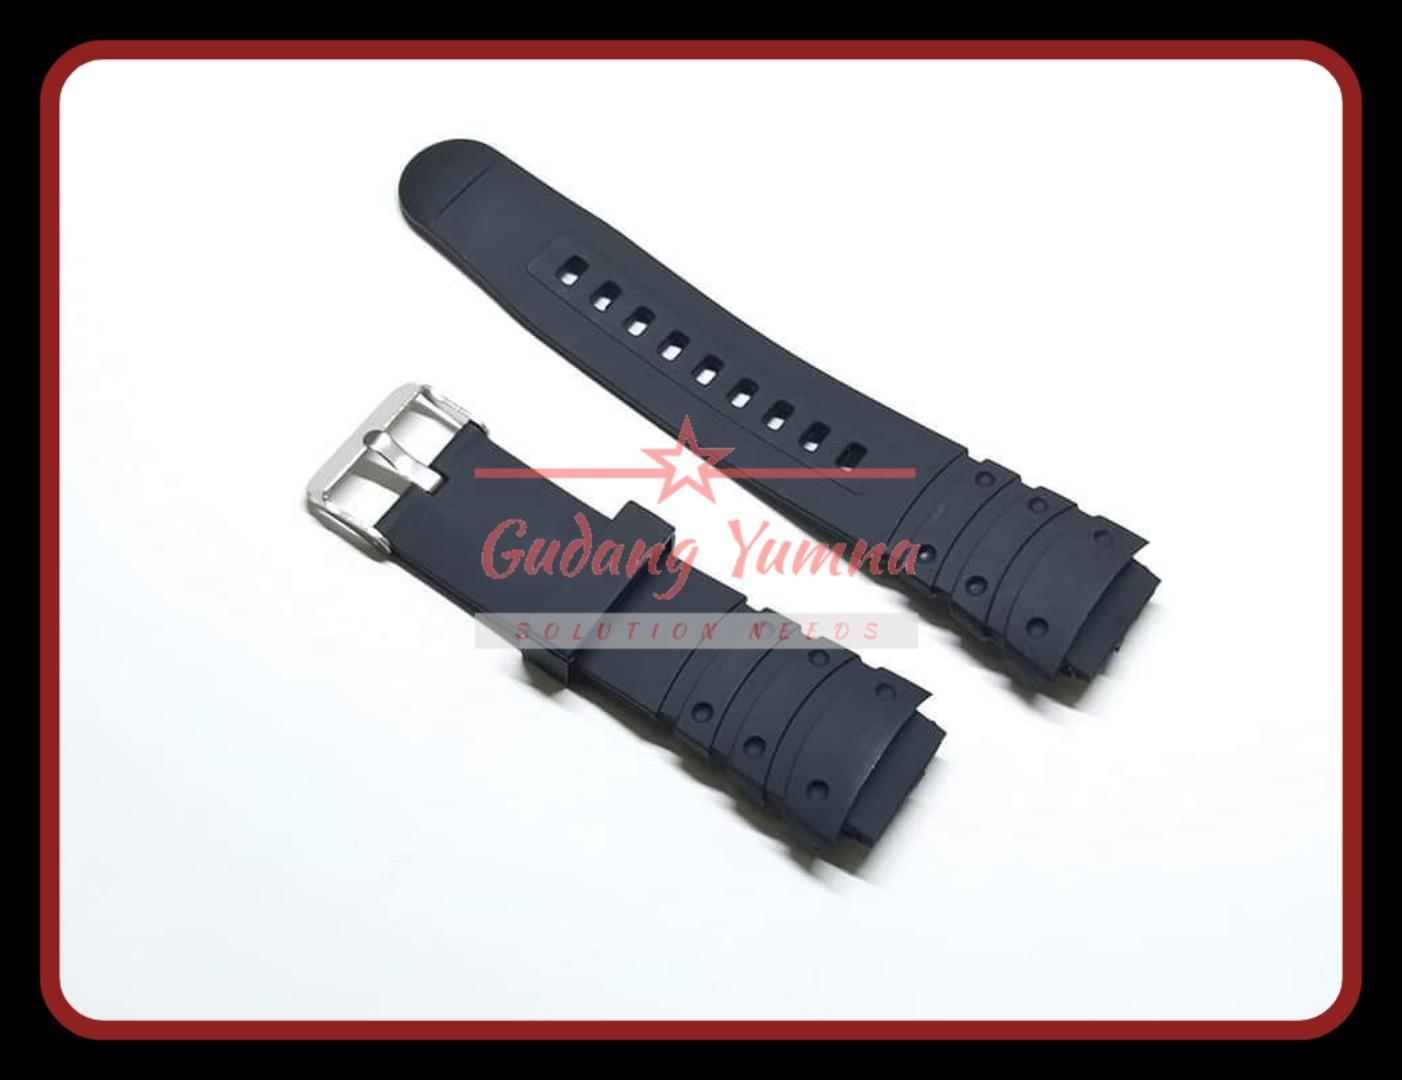 Strap watch tali jam tangan skmei 1231 DG1231DG-1231DG 1231